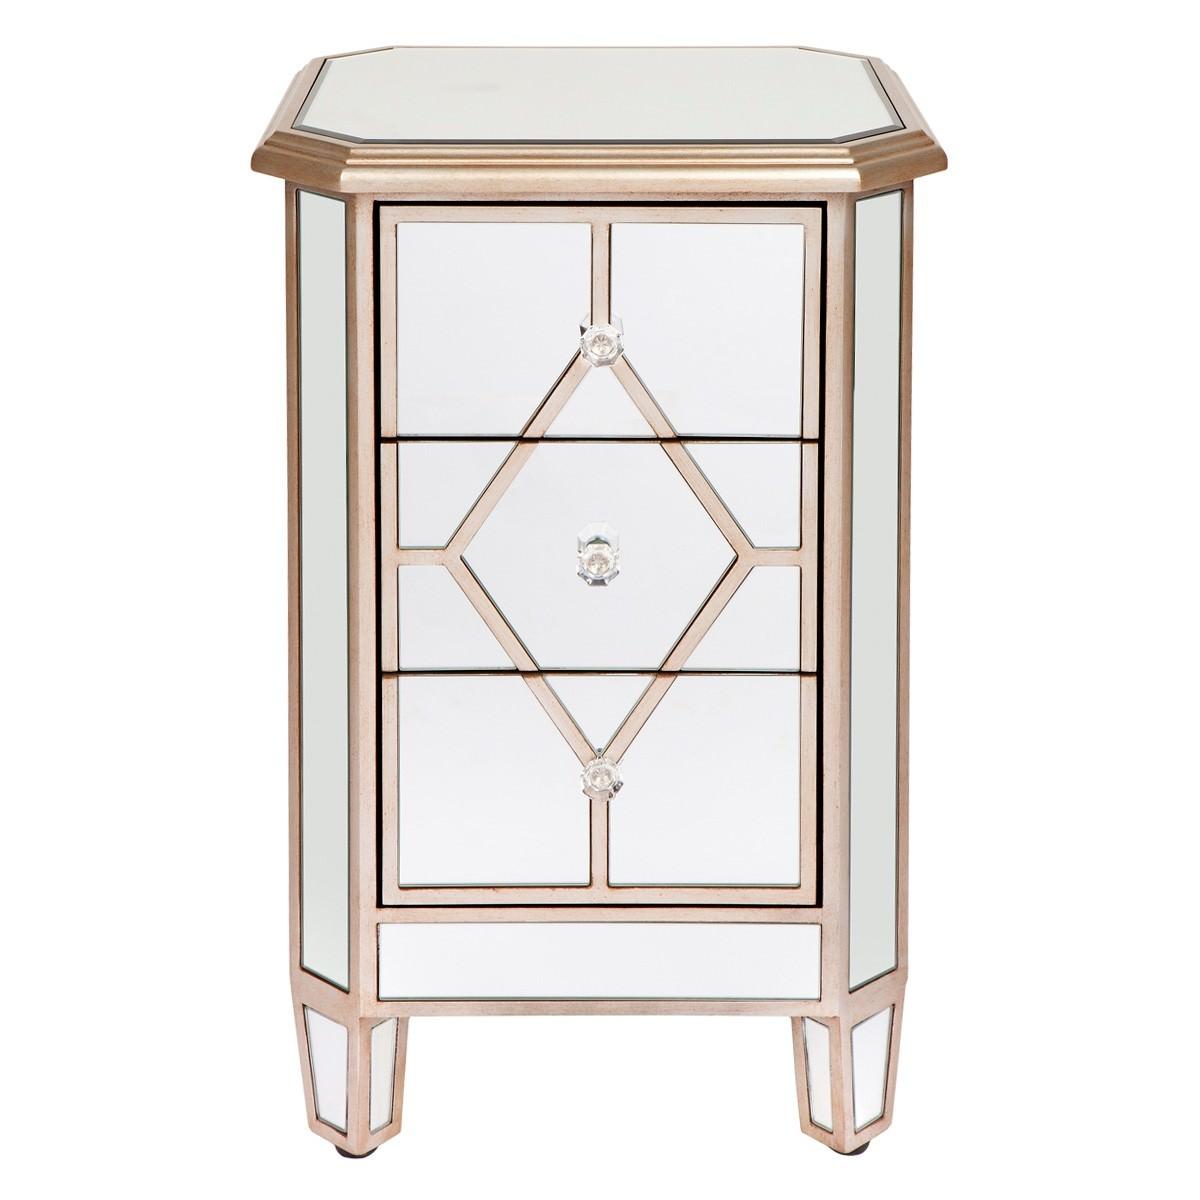 Kensington Mirrored Bedside Table